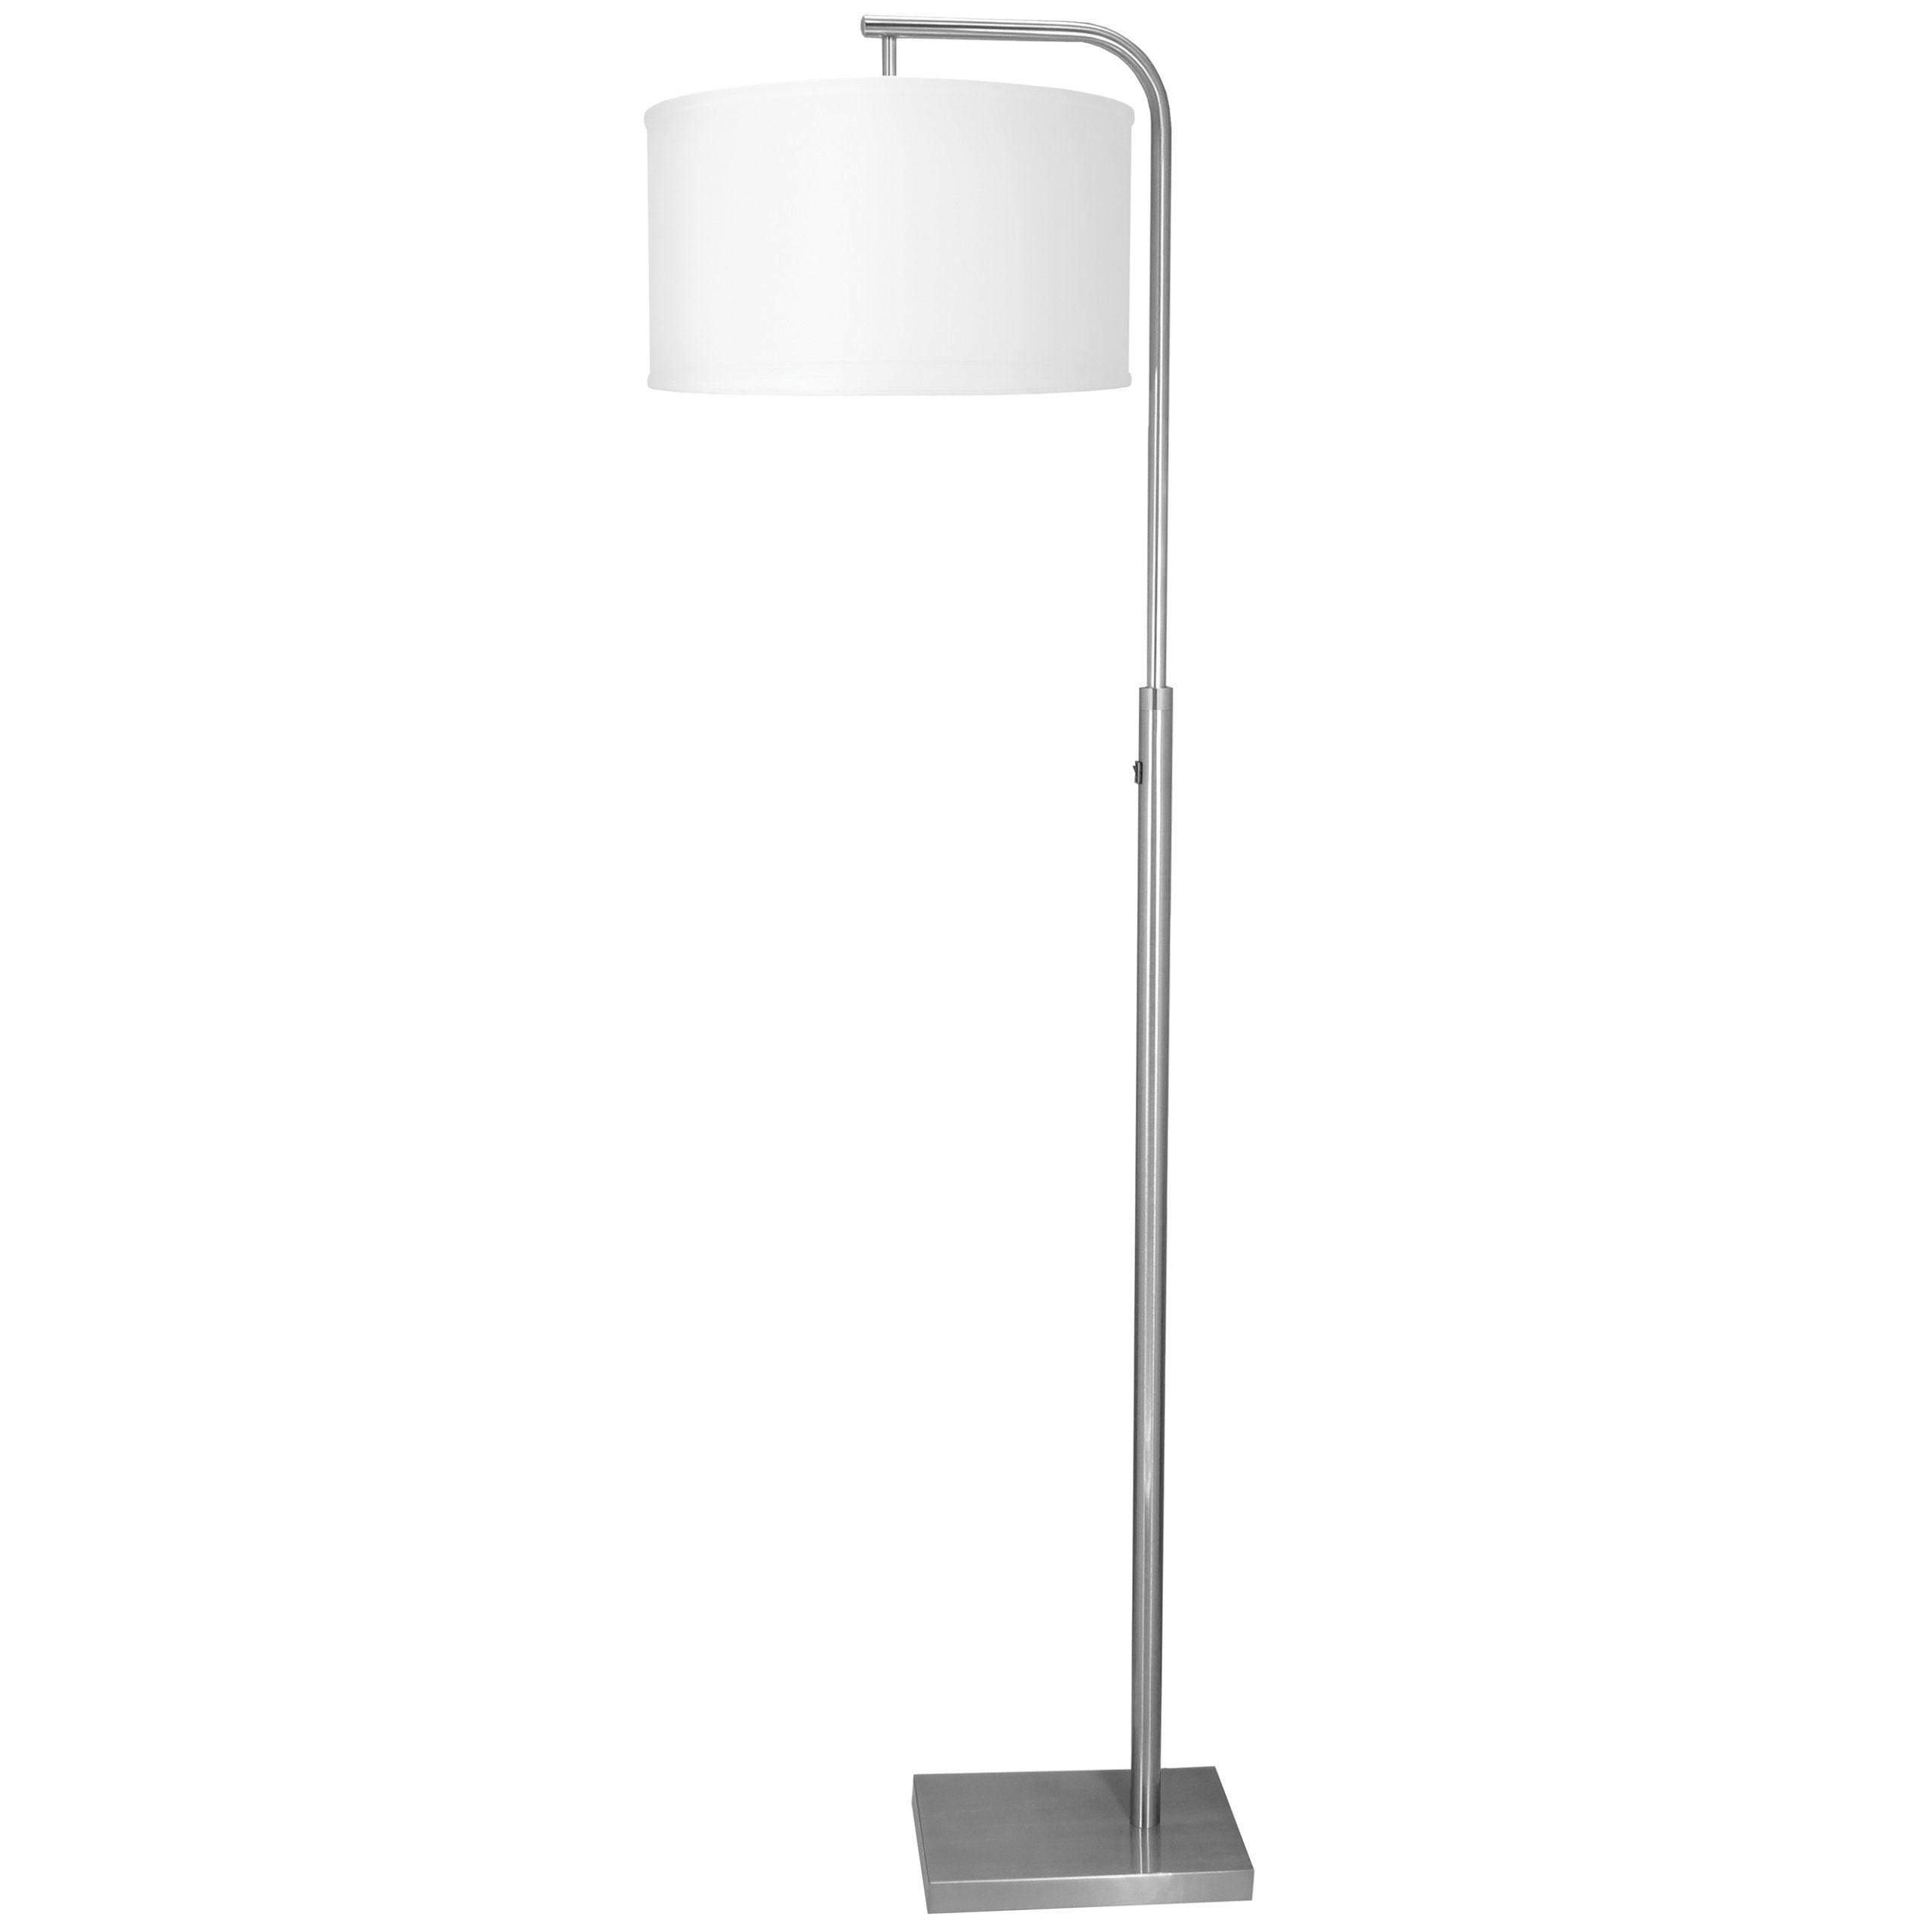 Onslow Floor Lamp